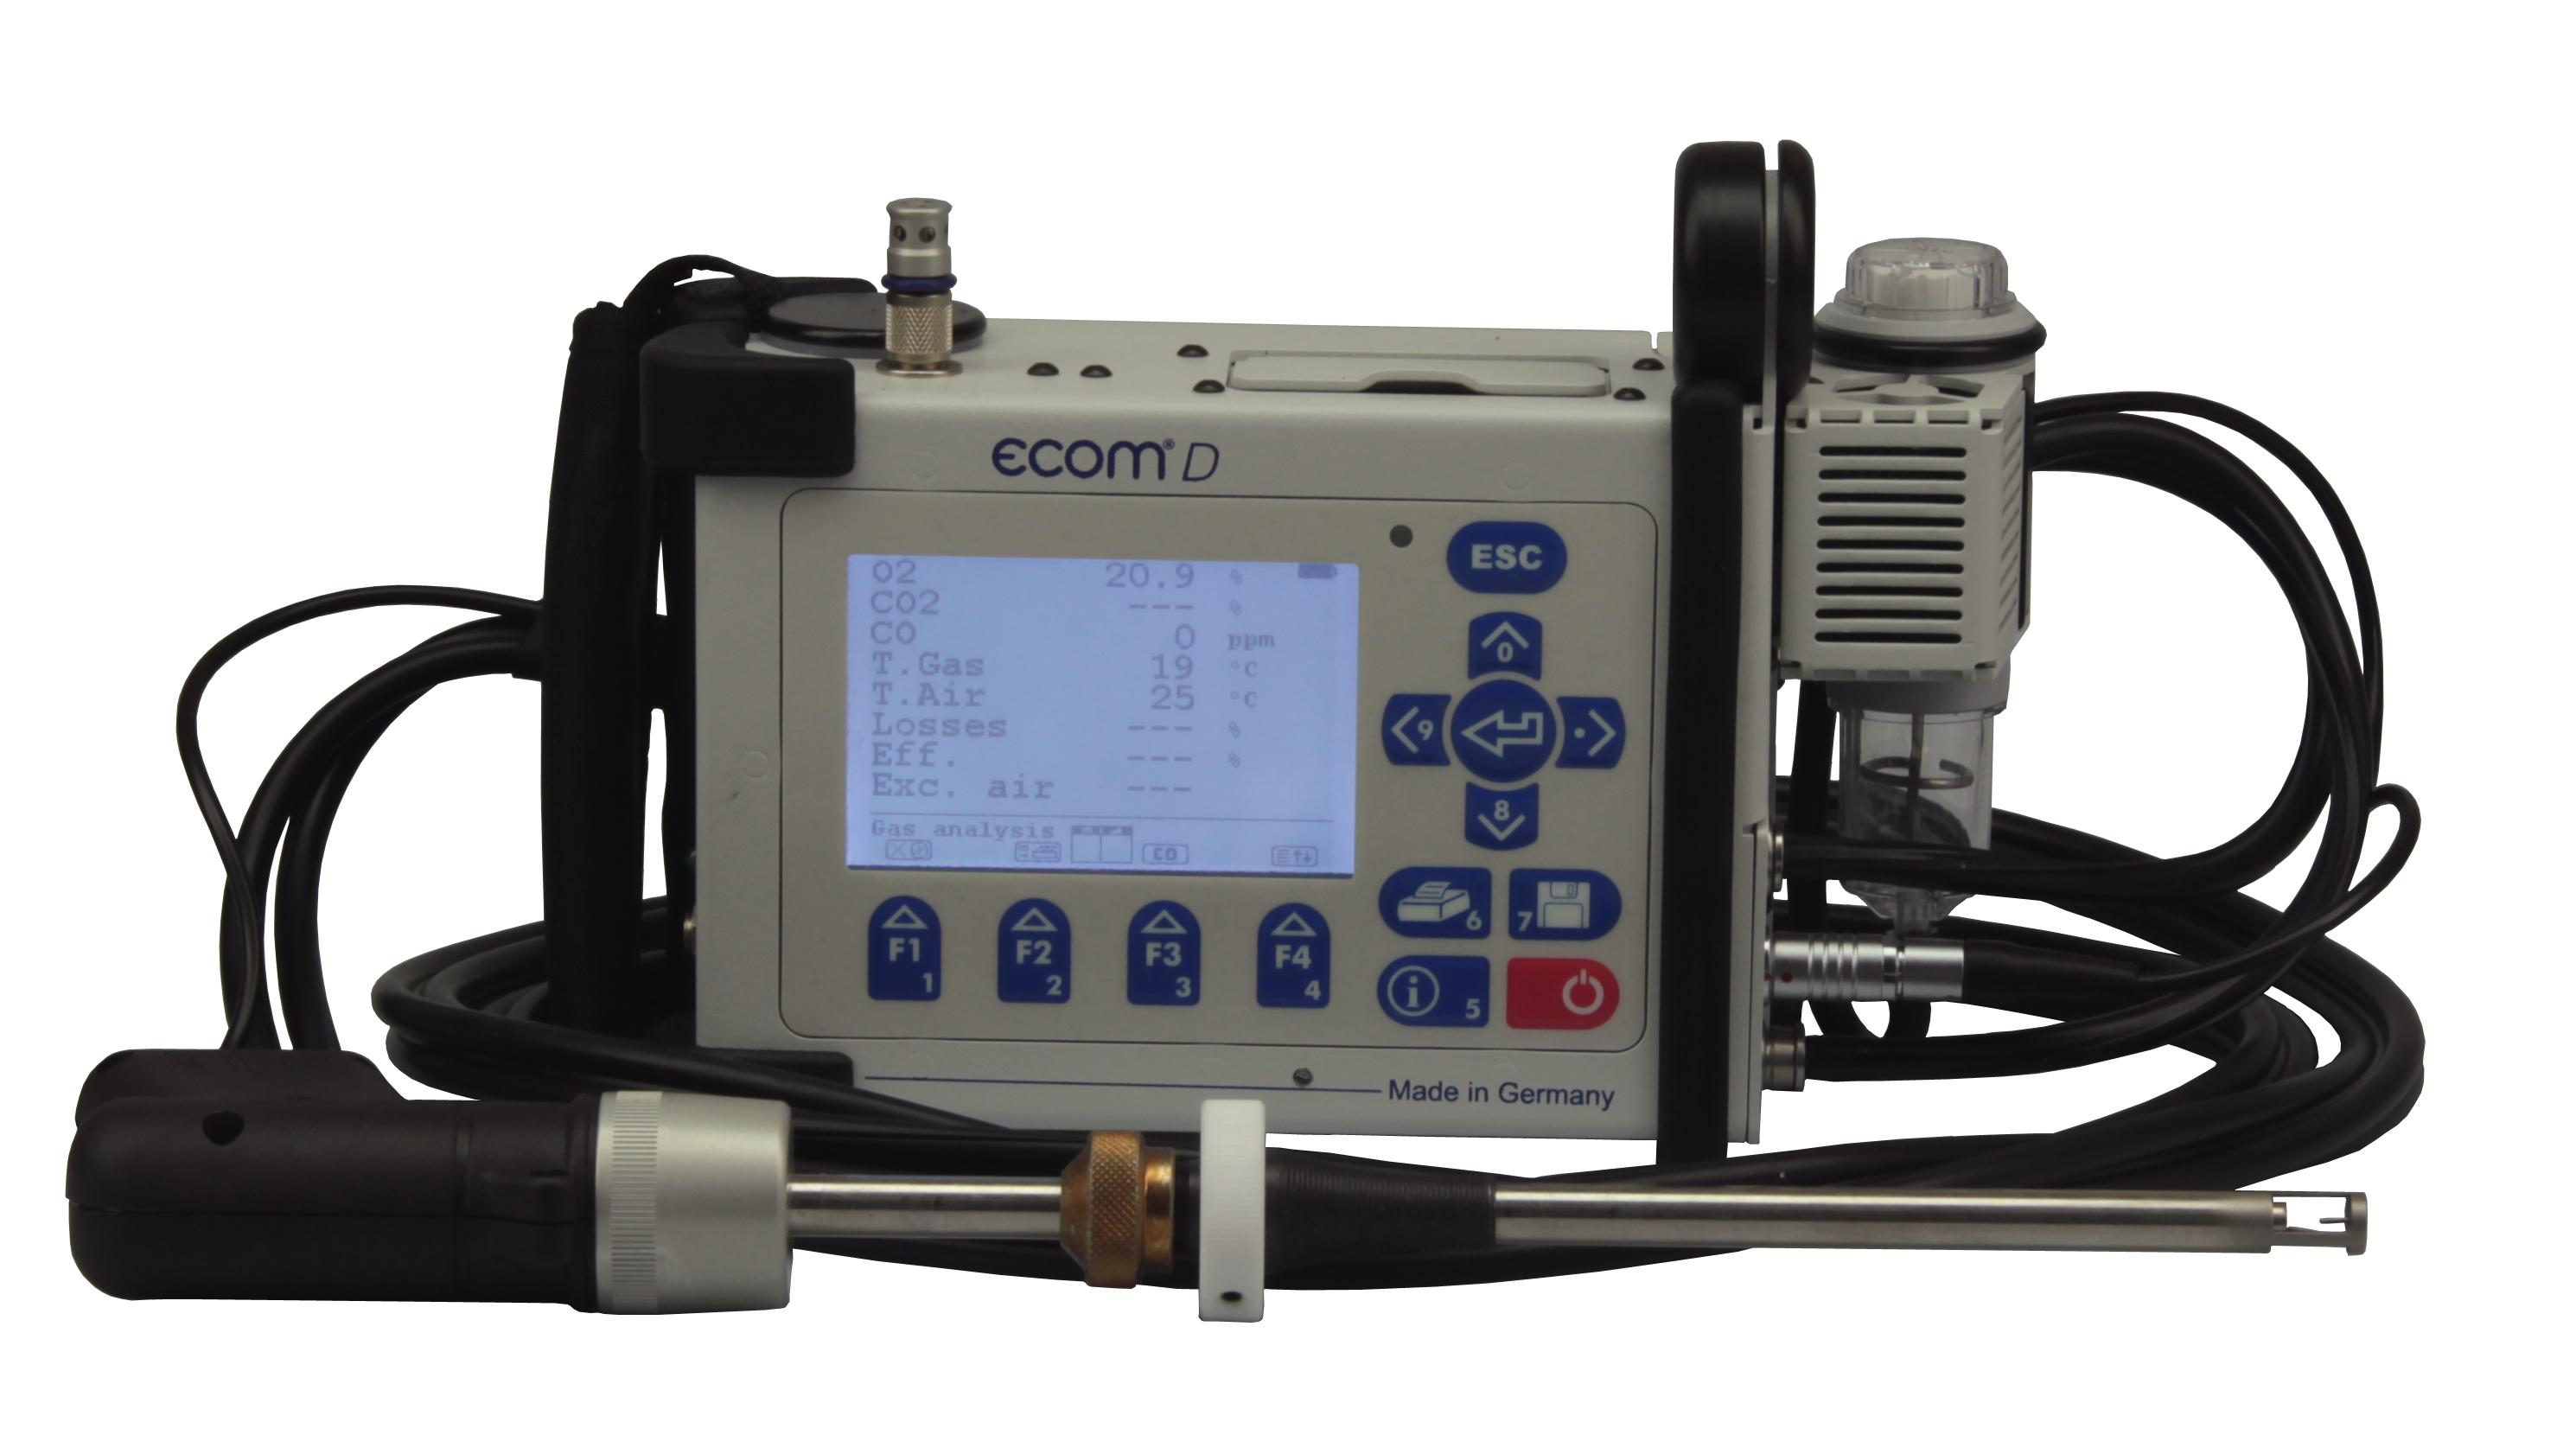 ecom_D with cooler